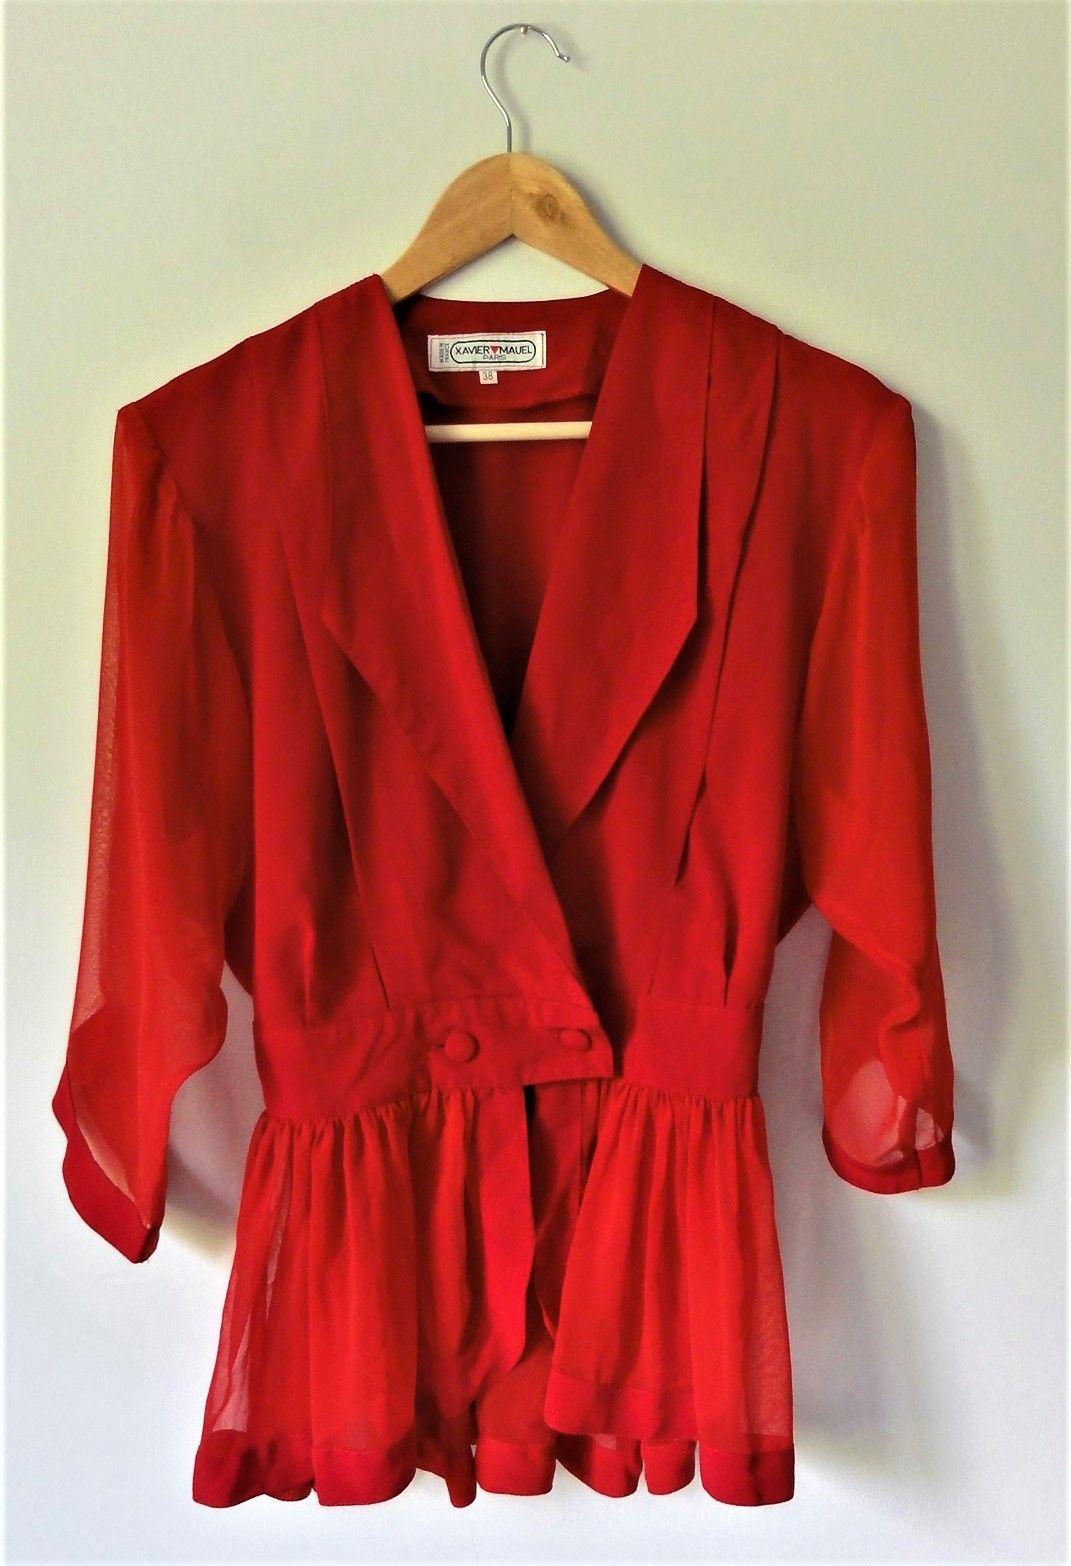 Niepowtarzalna vintage bluzka od Xavier Mauel Paris - PONOŚ SE vintage shop | JestemSlow.pl